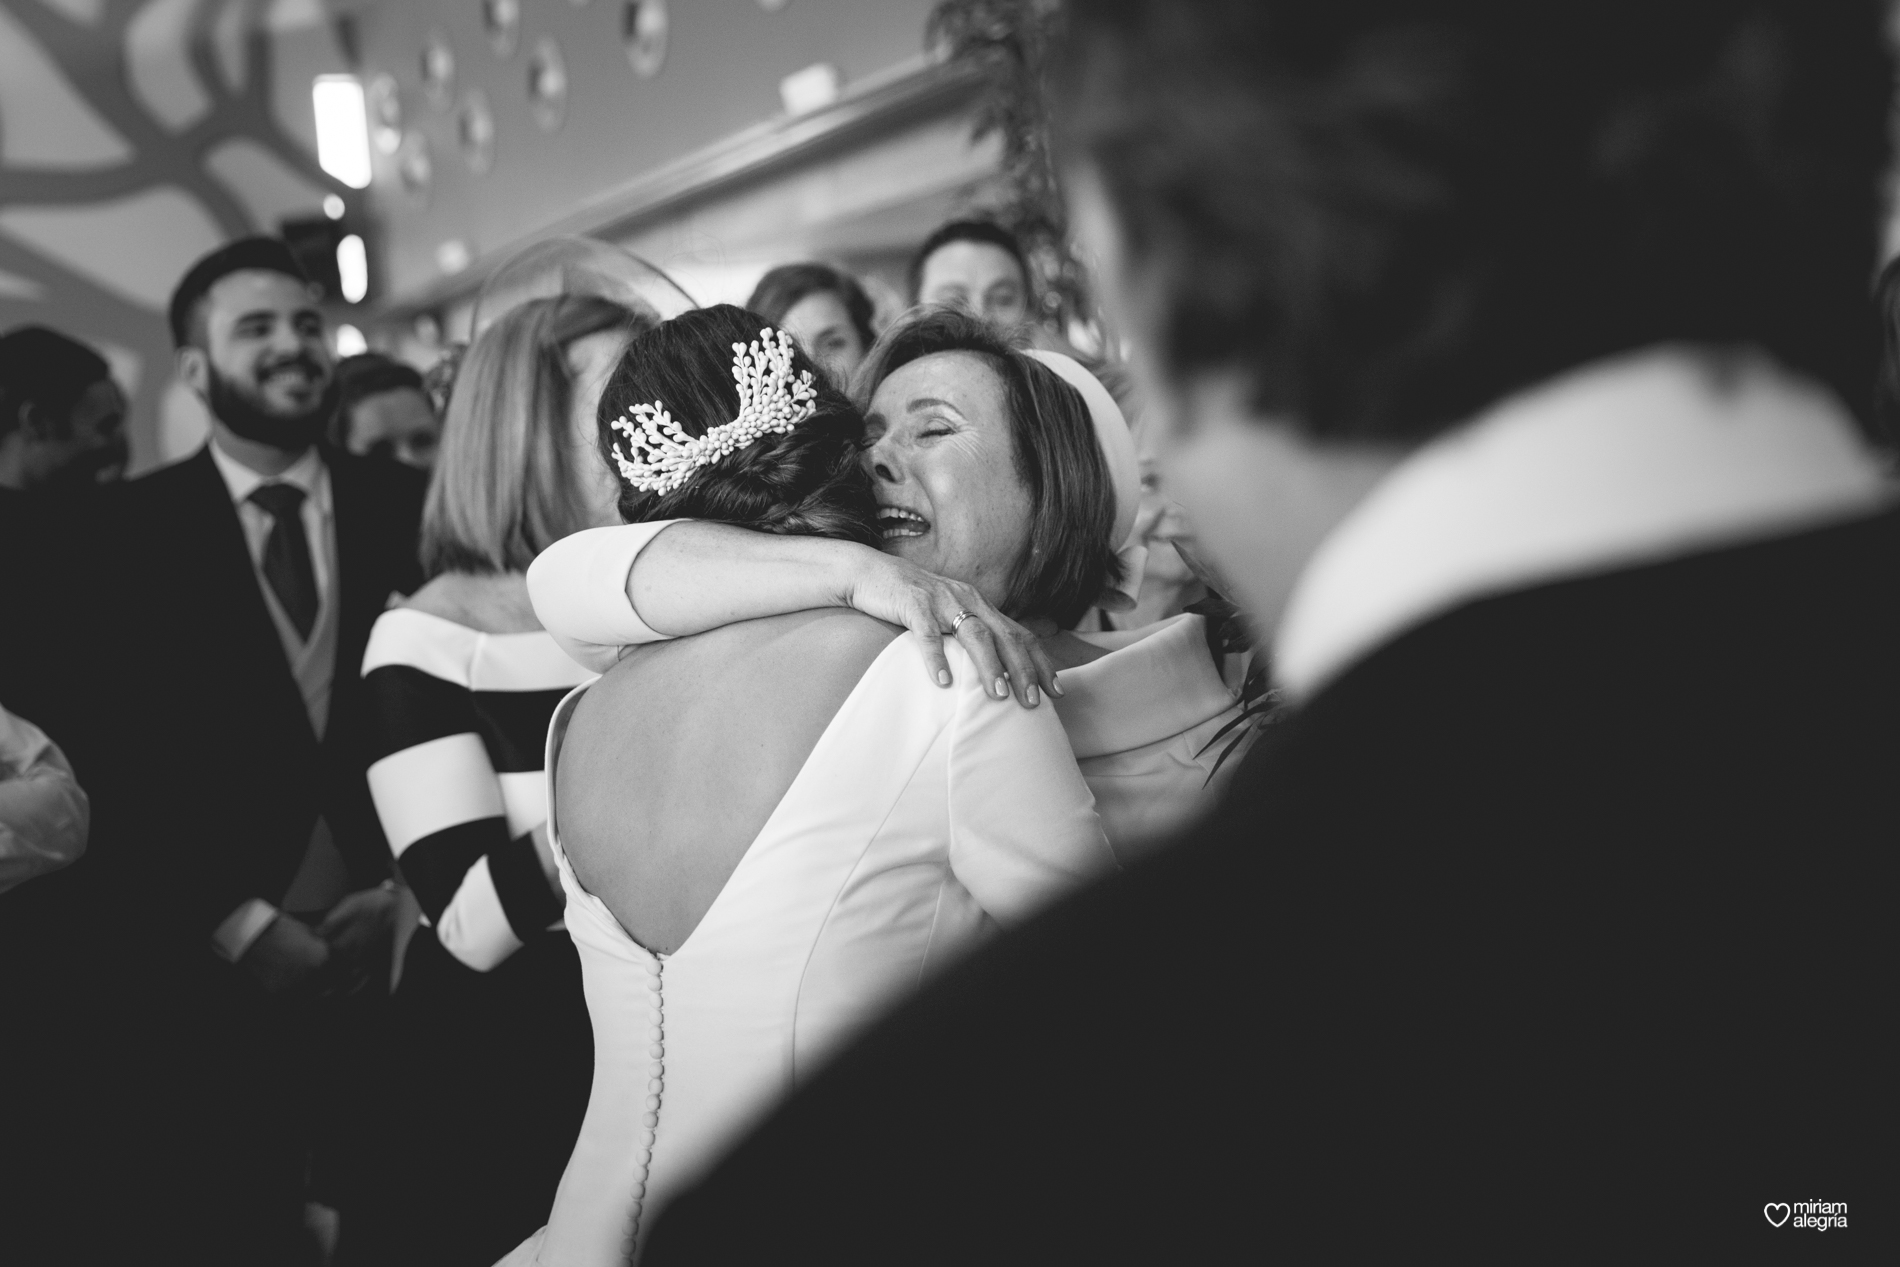 boda-en-la-catedral-de-murcia-miriam-alegria-fotografos-boda-murcia-72